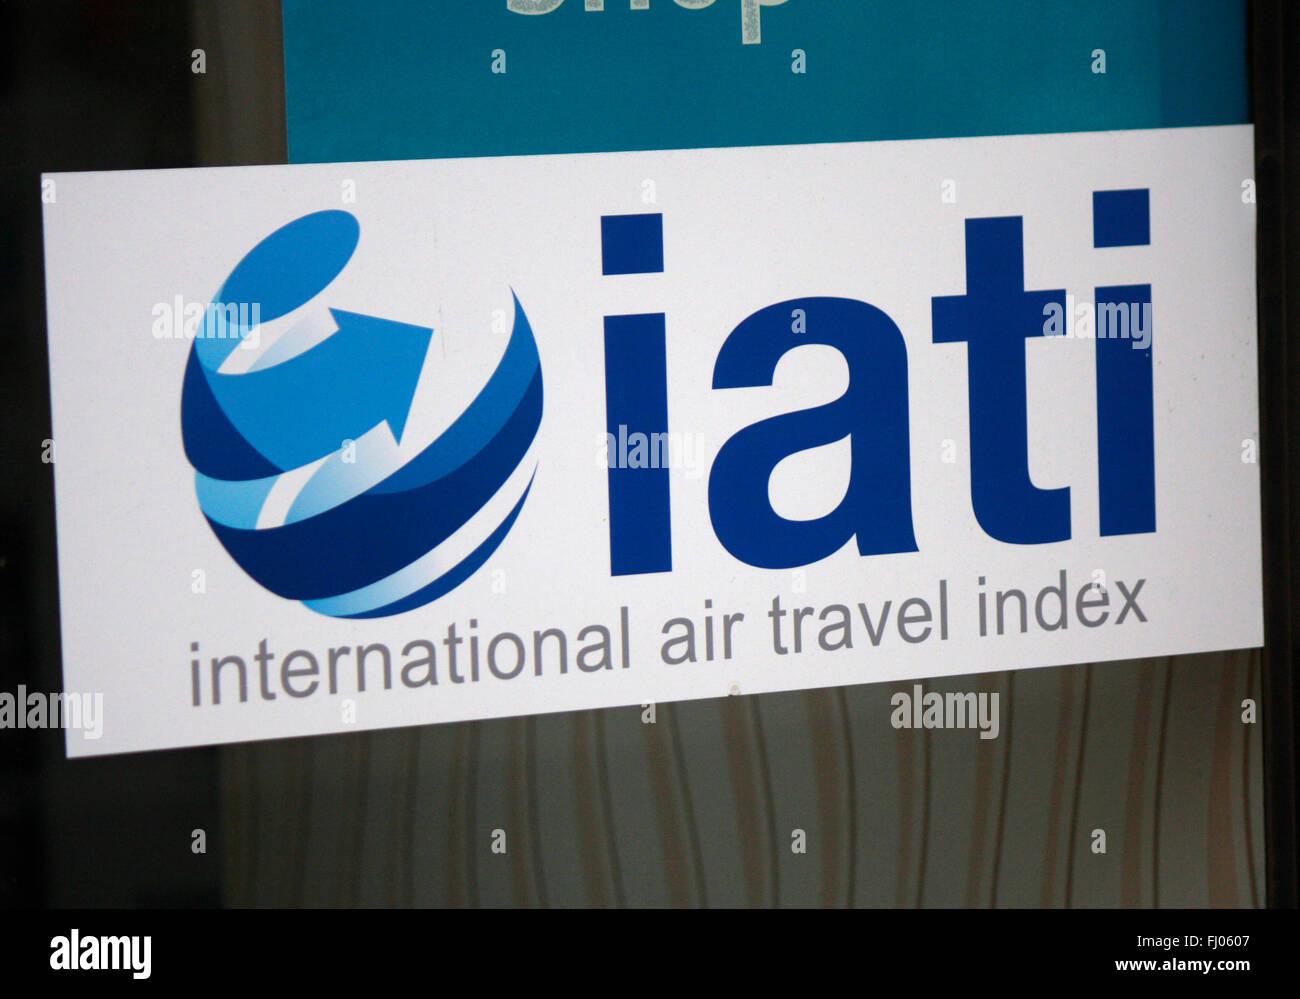 Markenname: 'Iati International Air Travel', Berlin. - Stock Image